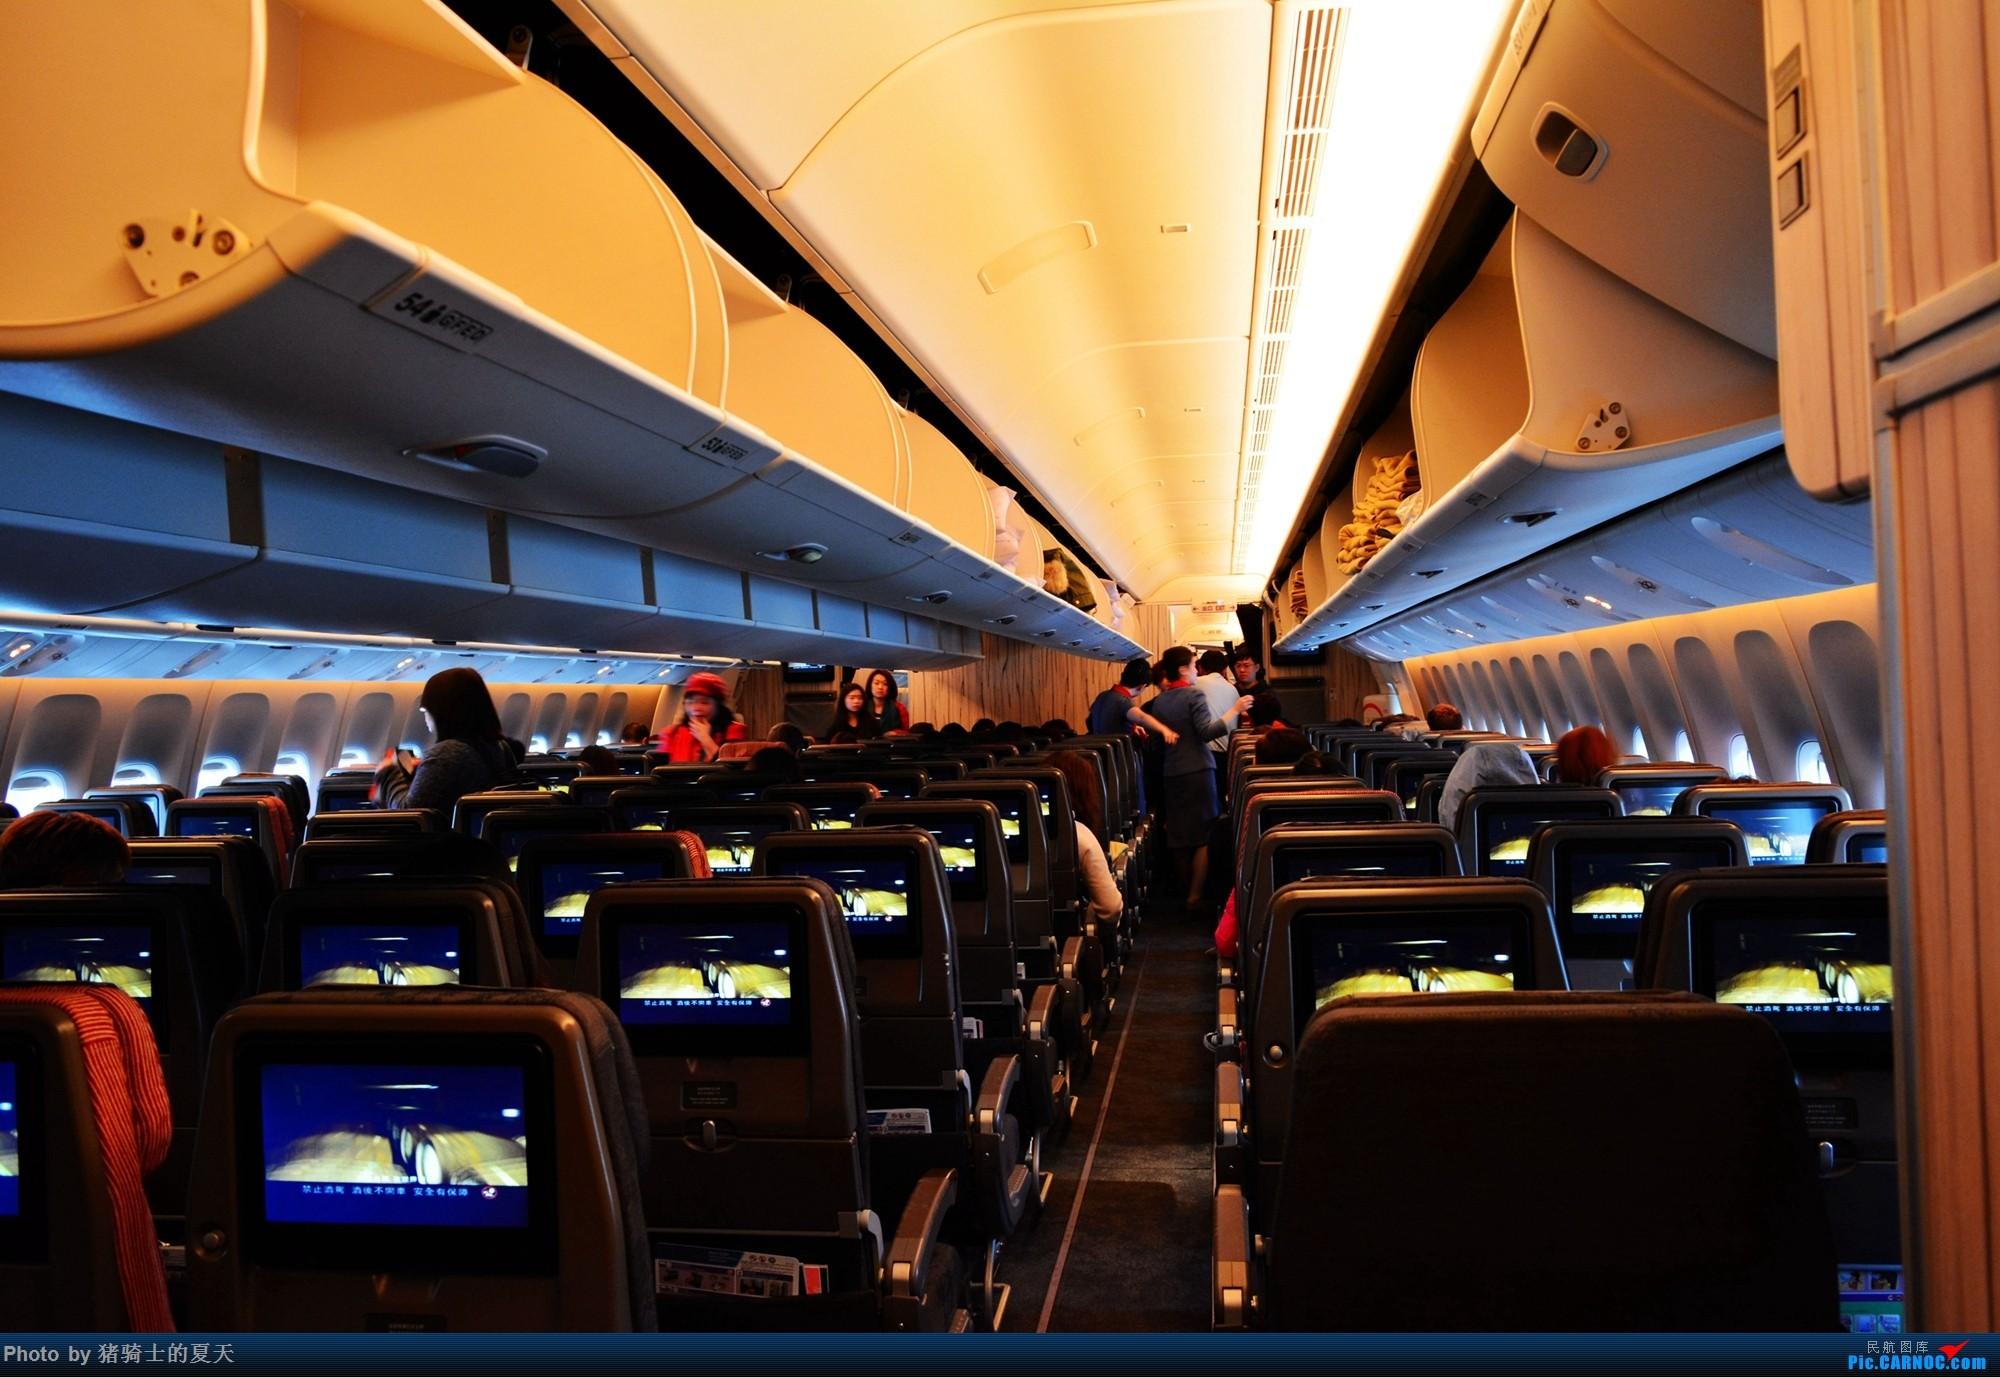 Re:2017年鸡鸭图 BOEING 777-300ER B-18053 中国台北桃园国际机场